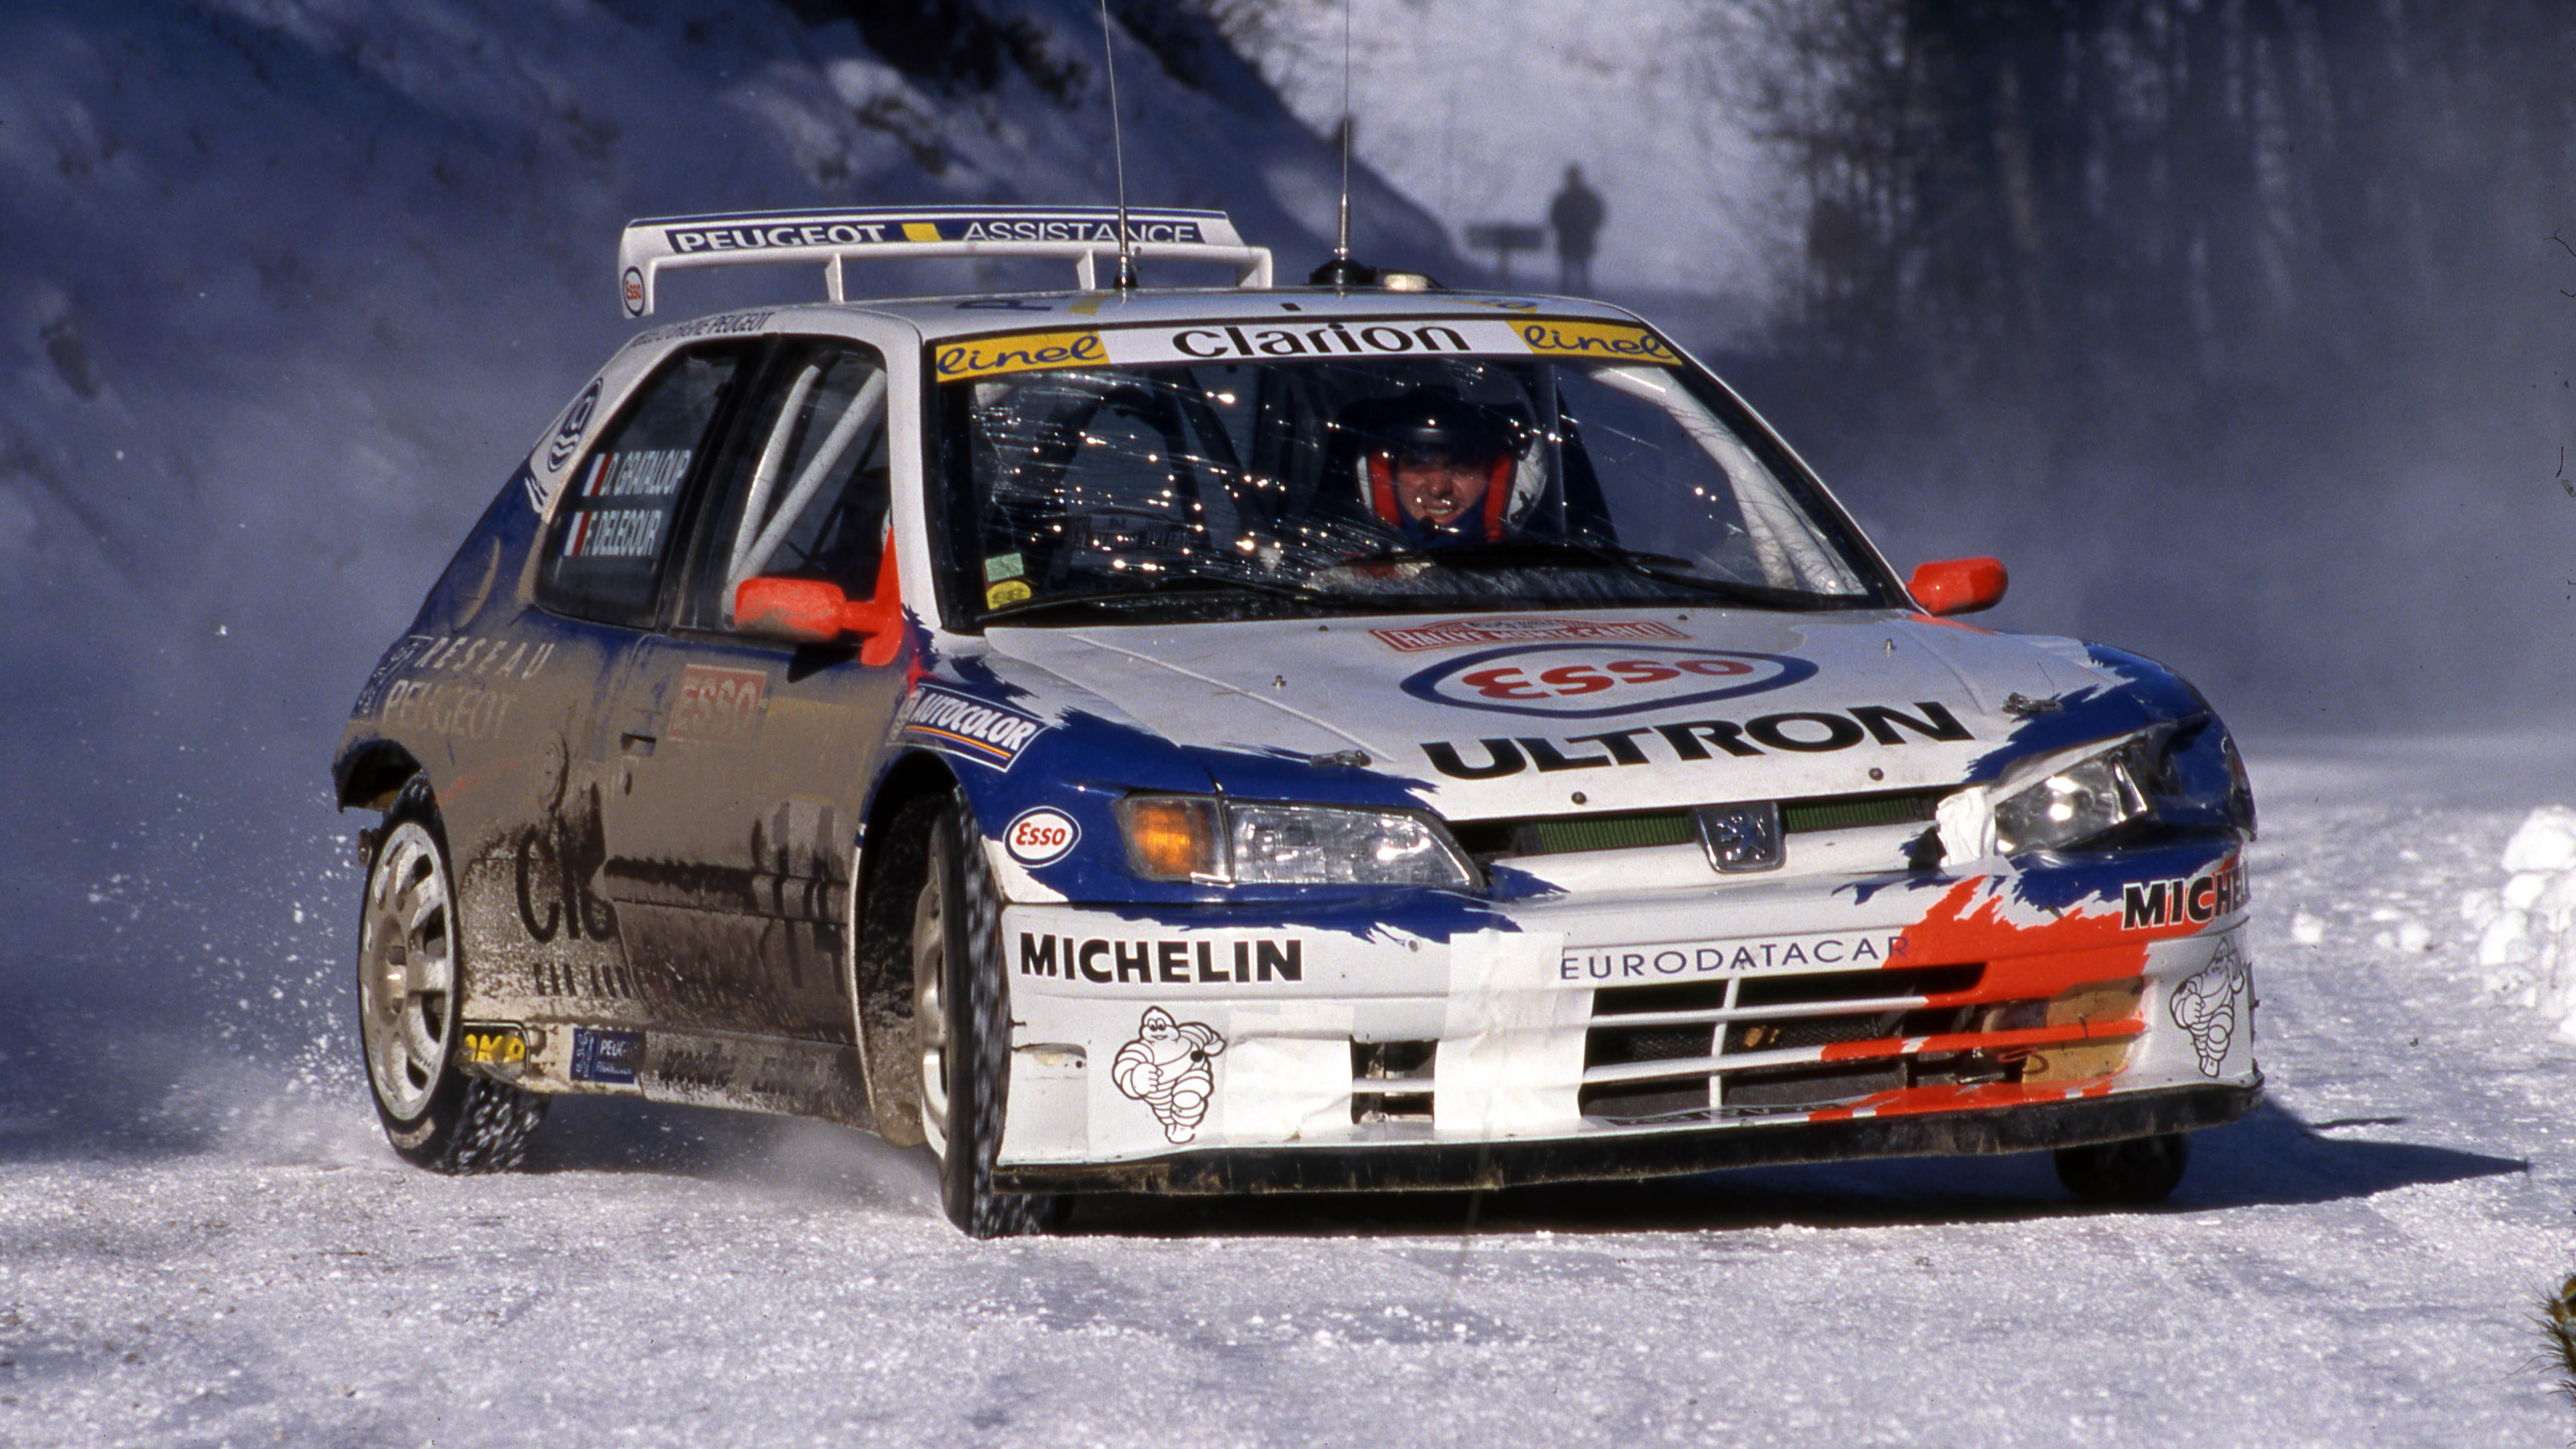 Peugeot 306 maxi car vrally